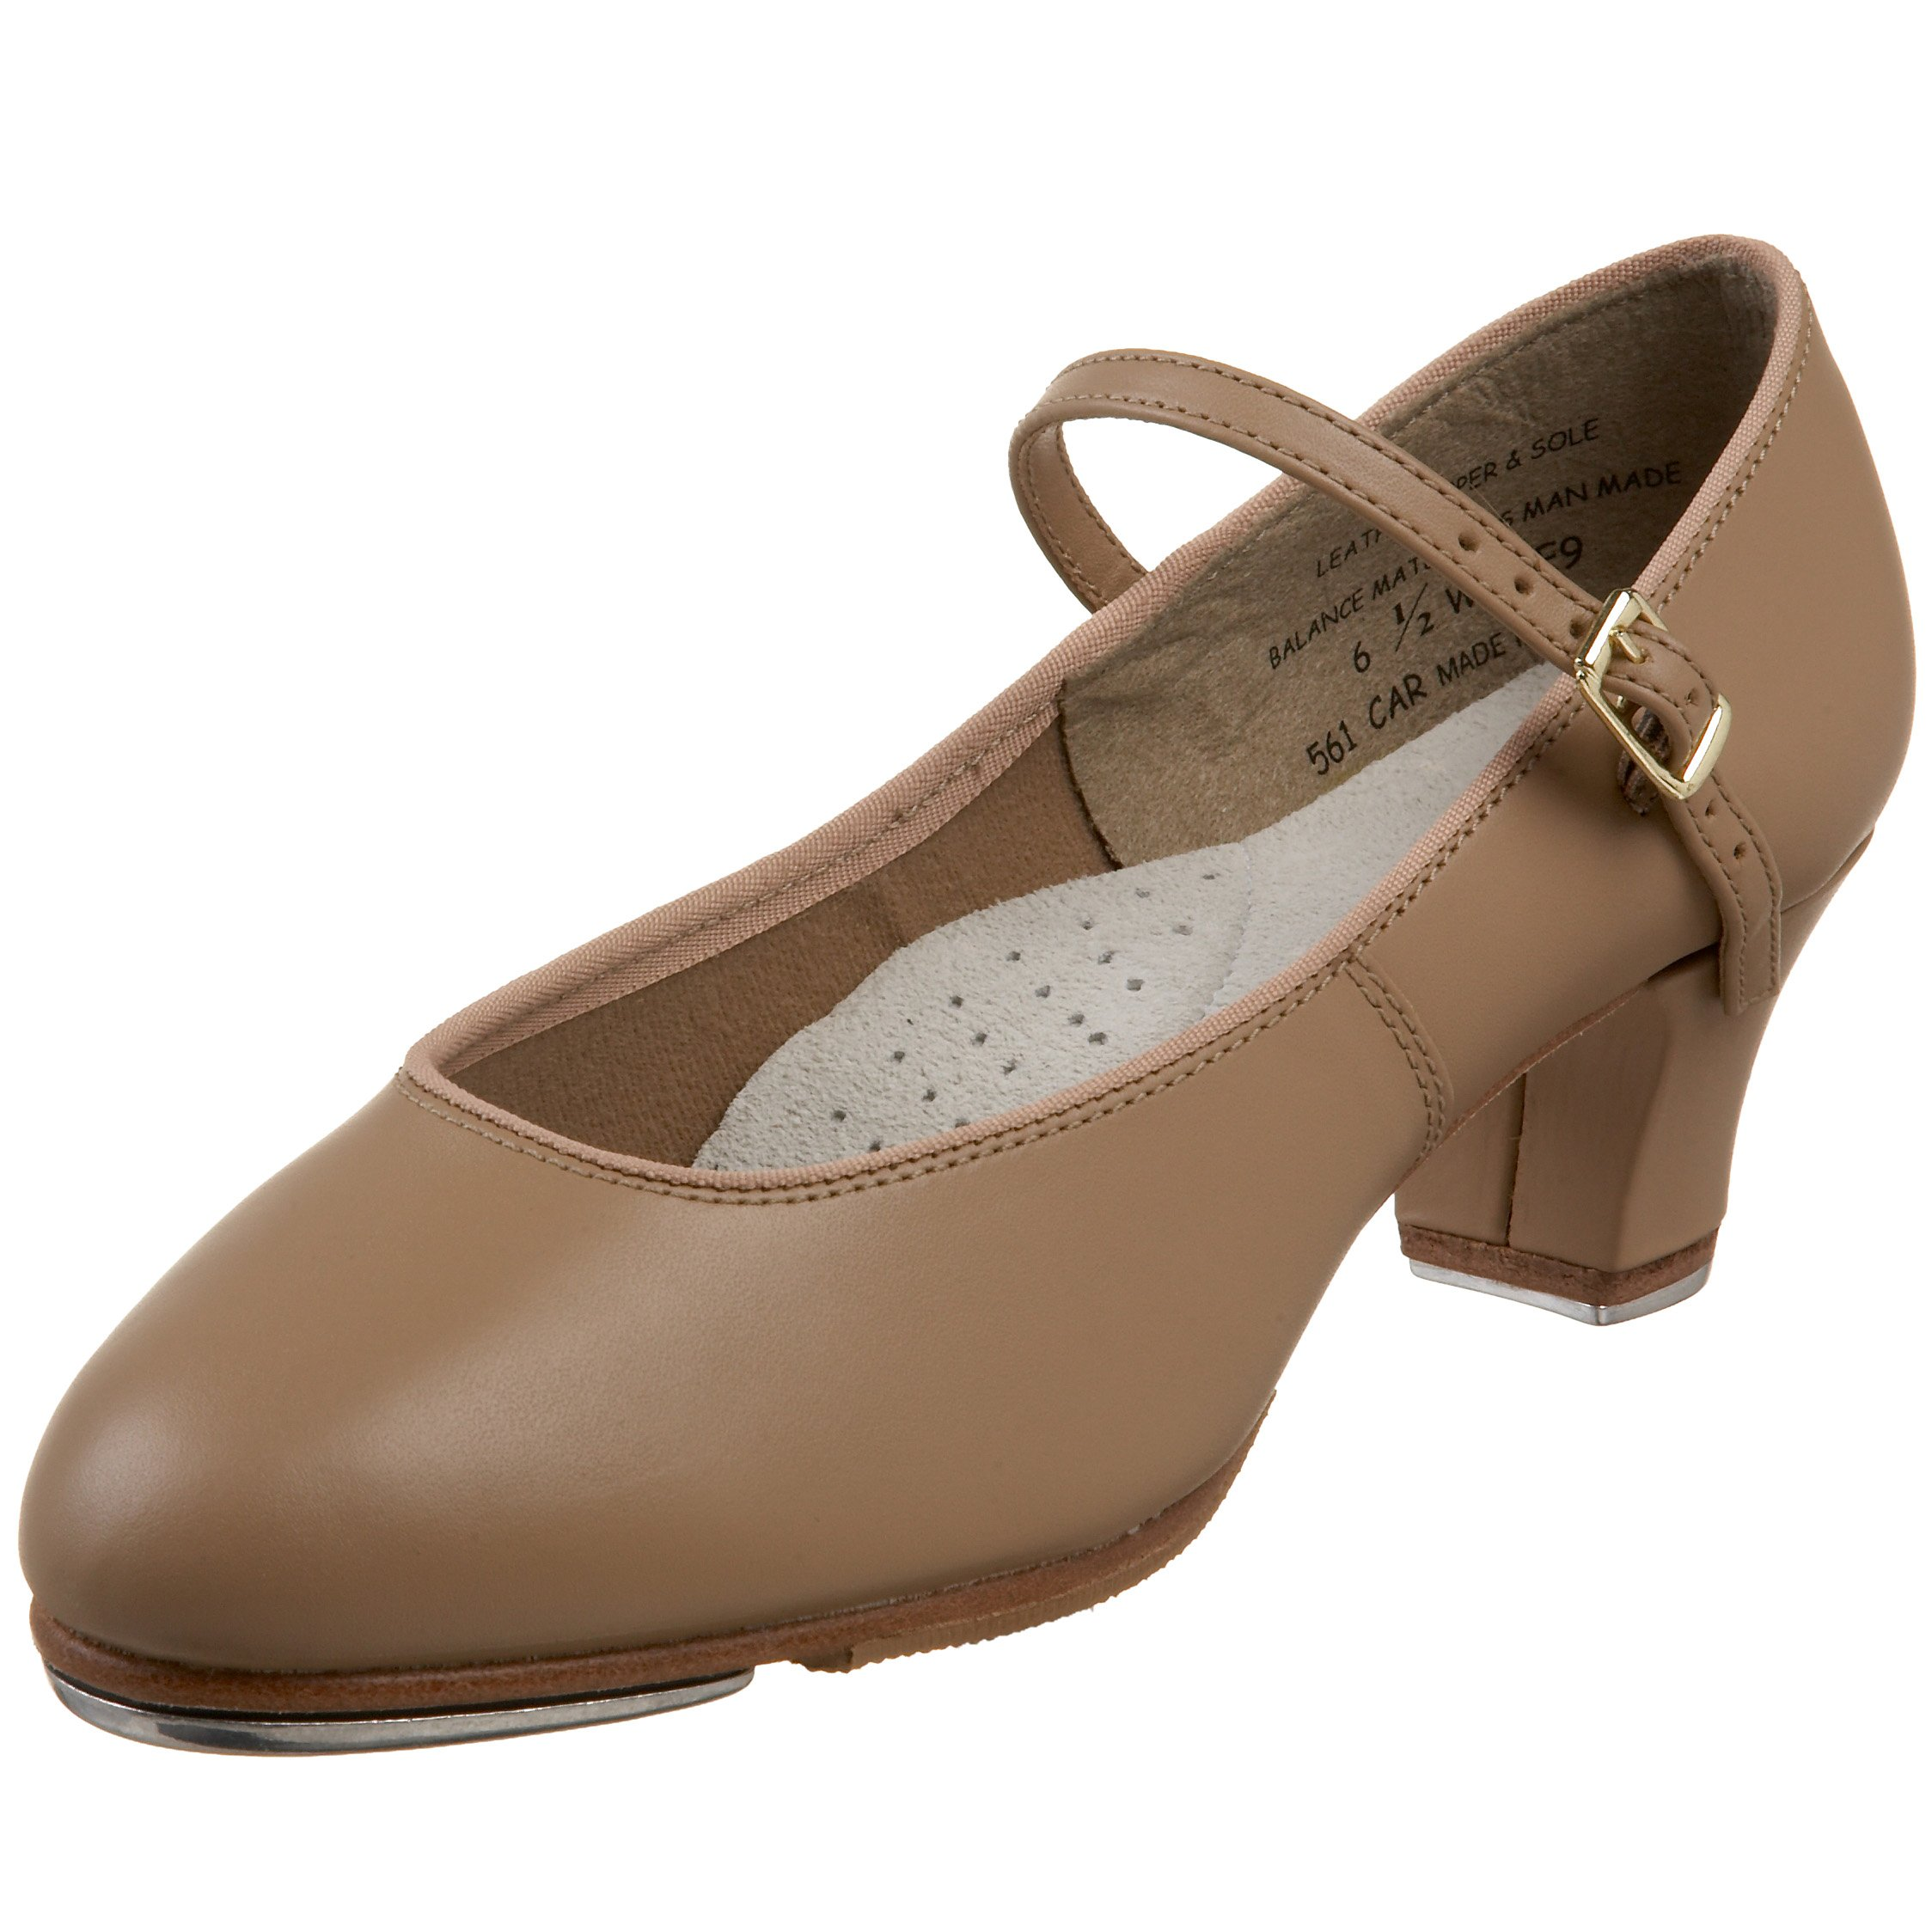 Capezio Women's Tap Jr. Footlight Tap Shoe,Caramel,6 M US